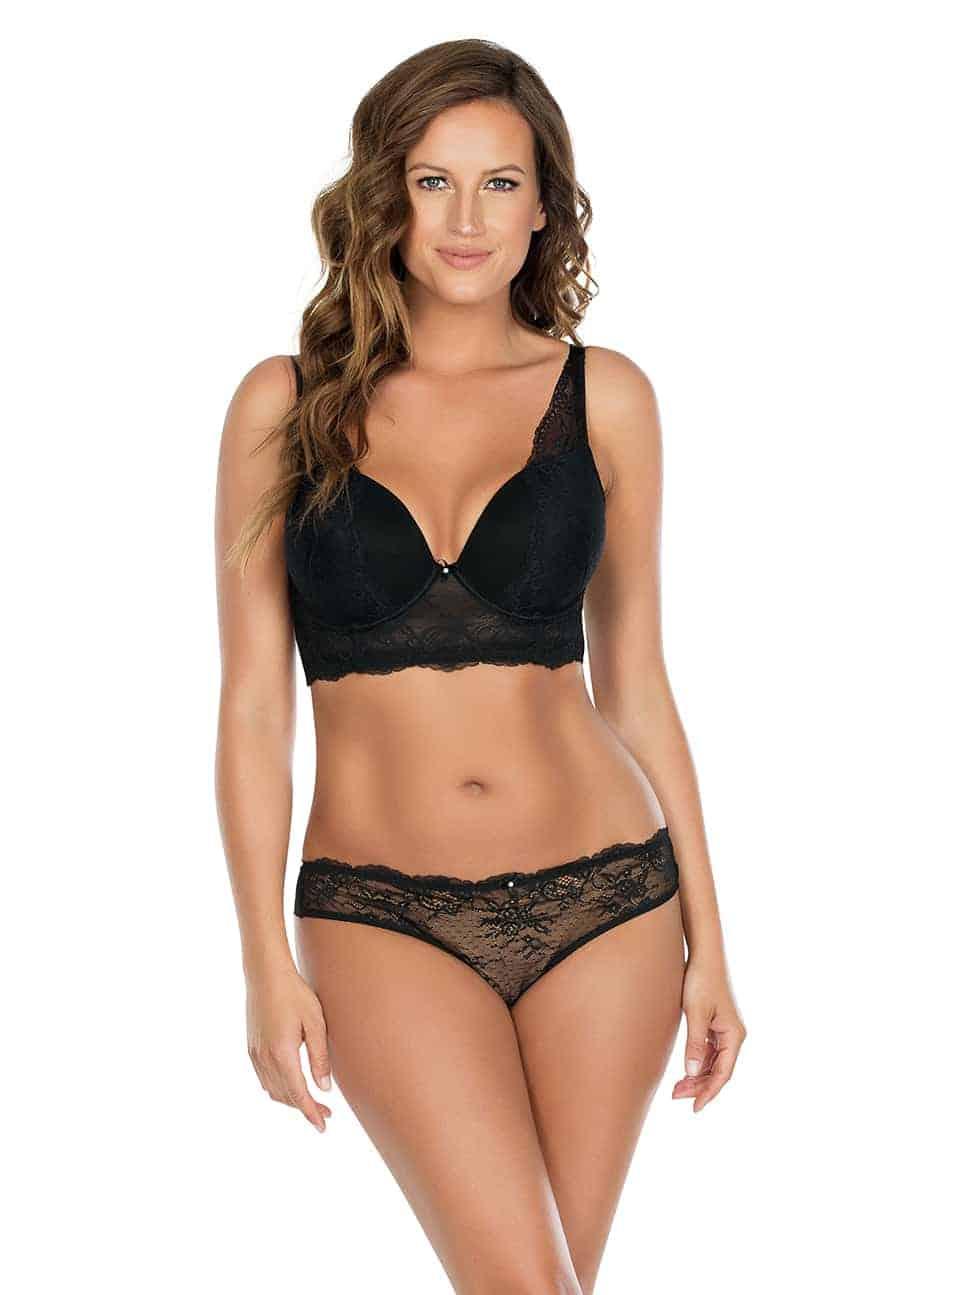 Sandrine PlungeLonglineBraP5351 BrazilianThongP5354 Black Front - Sandrine Brazilian Thong - Black - P5354